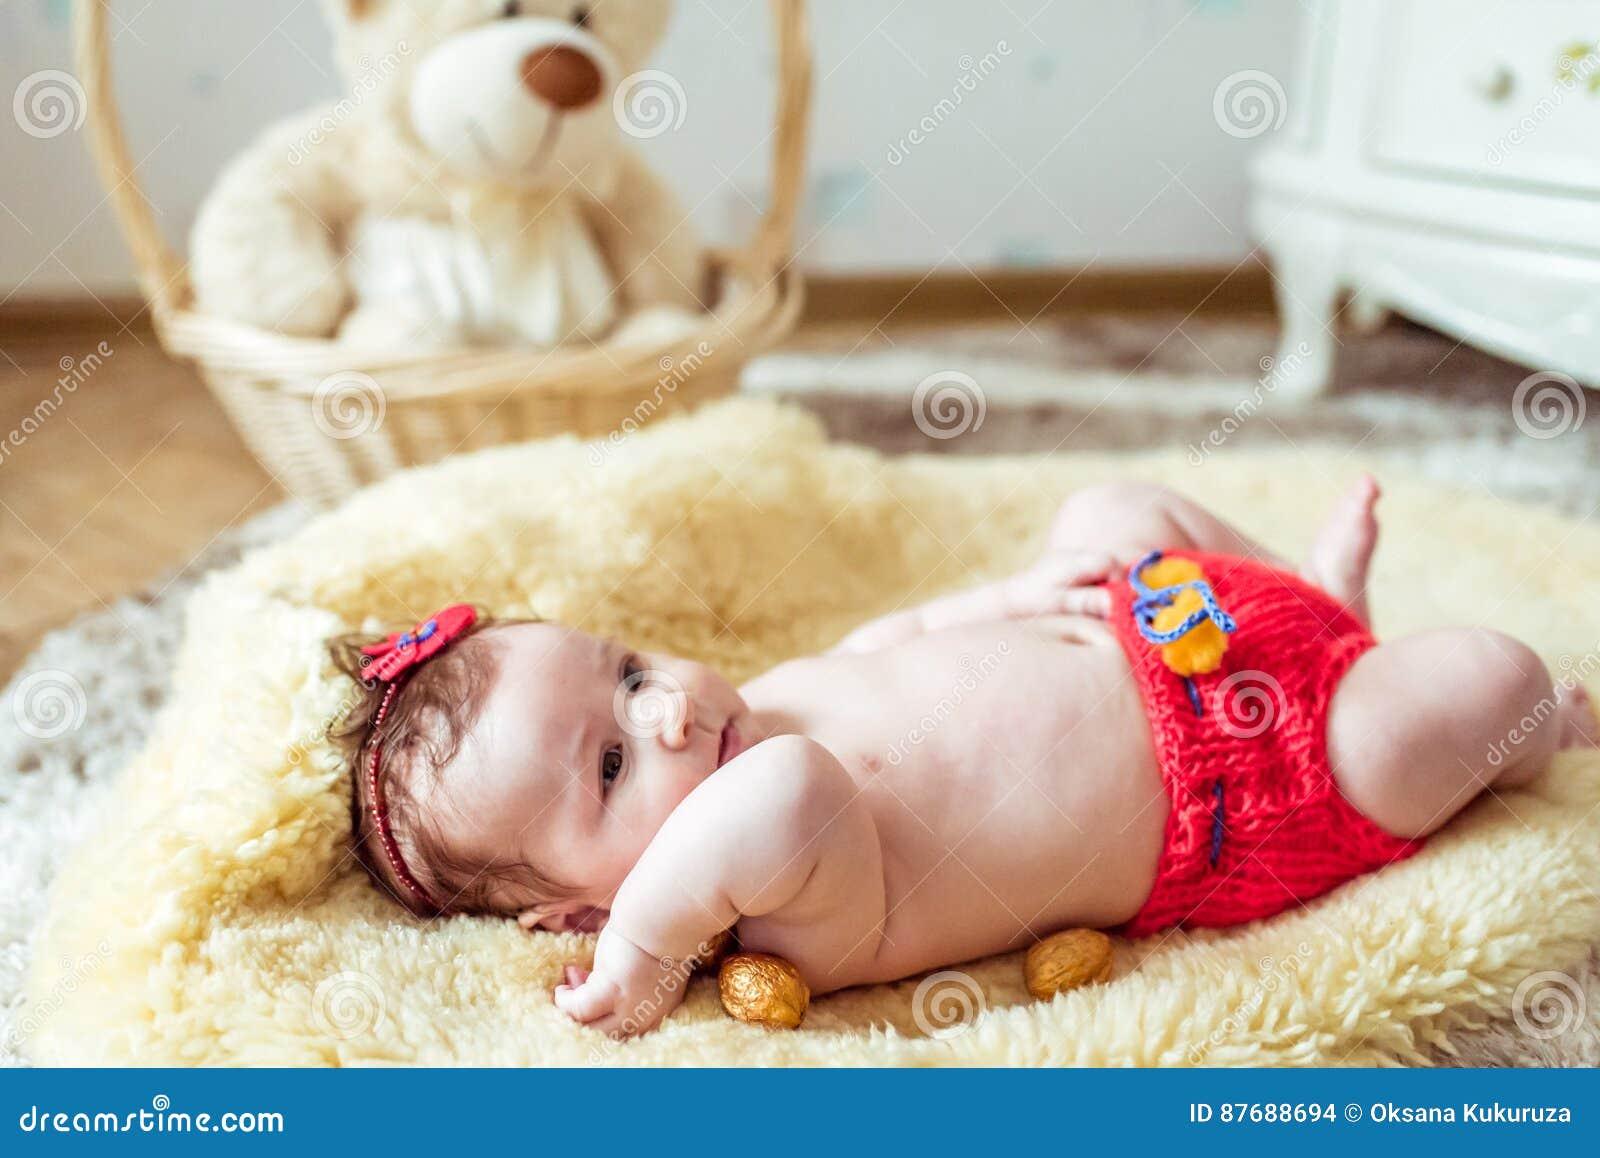 Naked baby!!! - BabyCenter